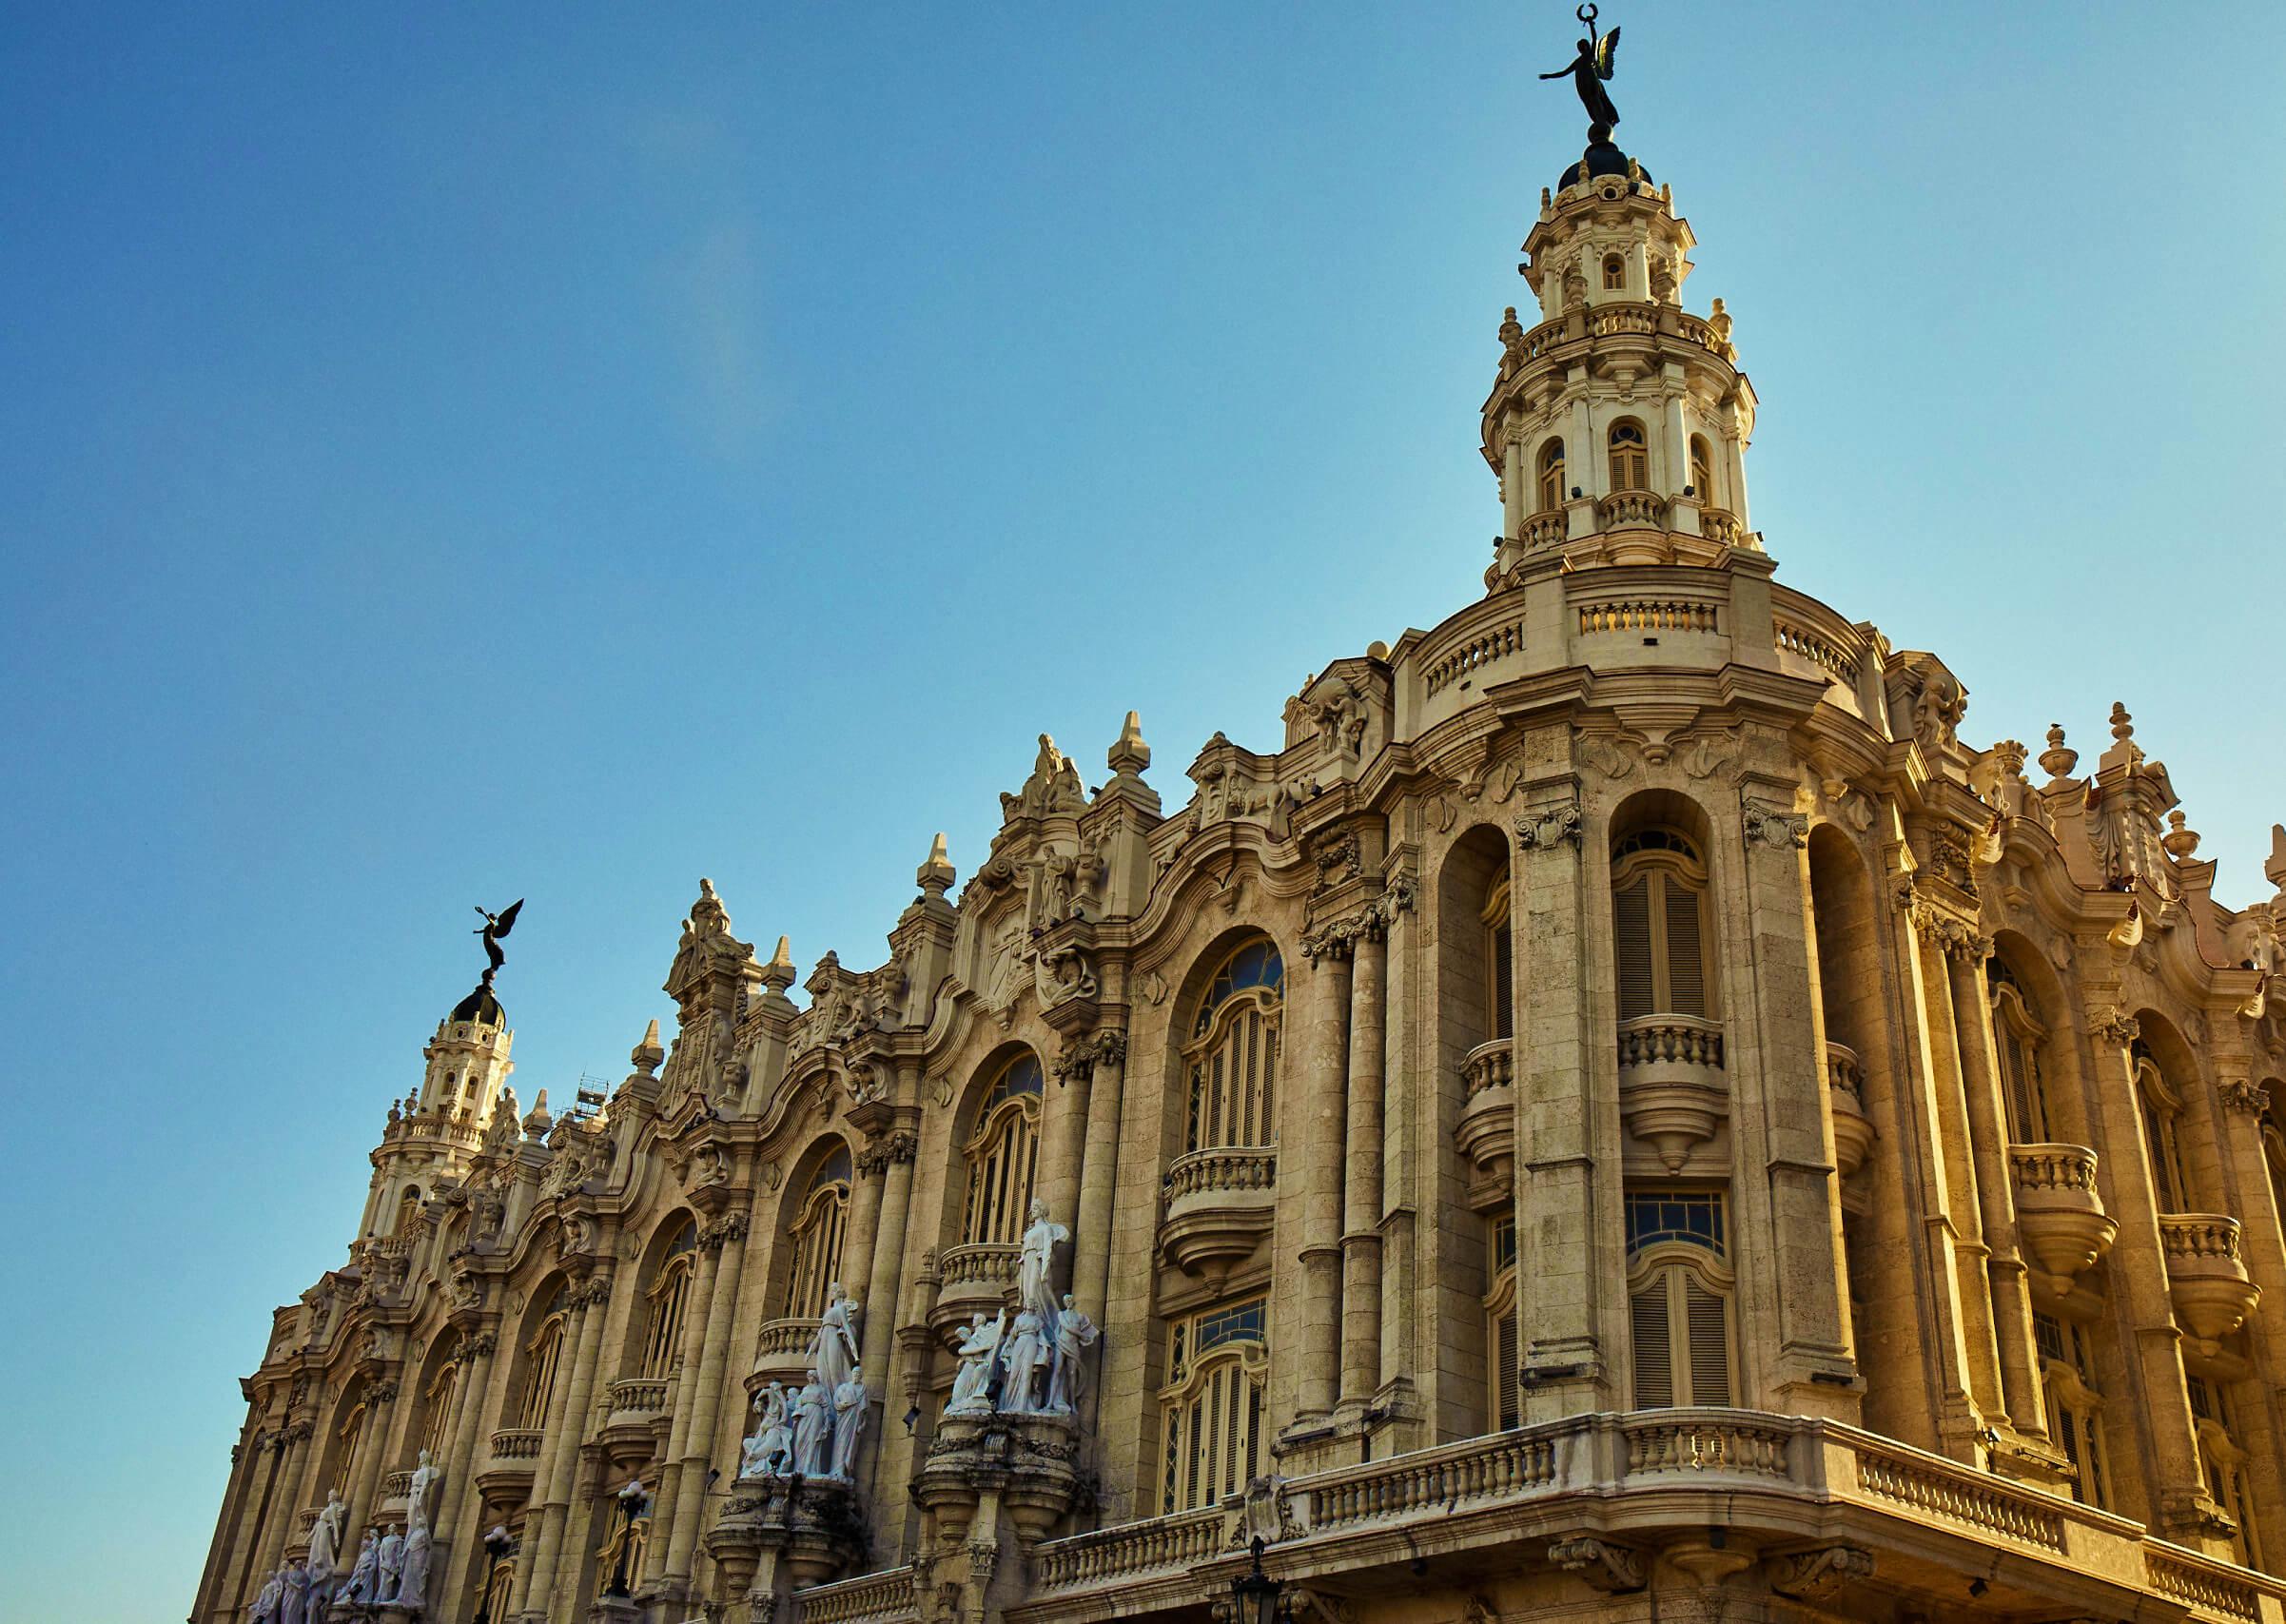 Cuba_Gran_Teatro_de_la_Habana_Alicia_Alonso_Opera_House.jpg